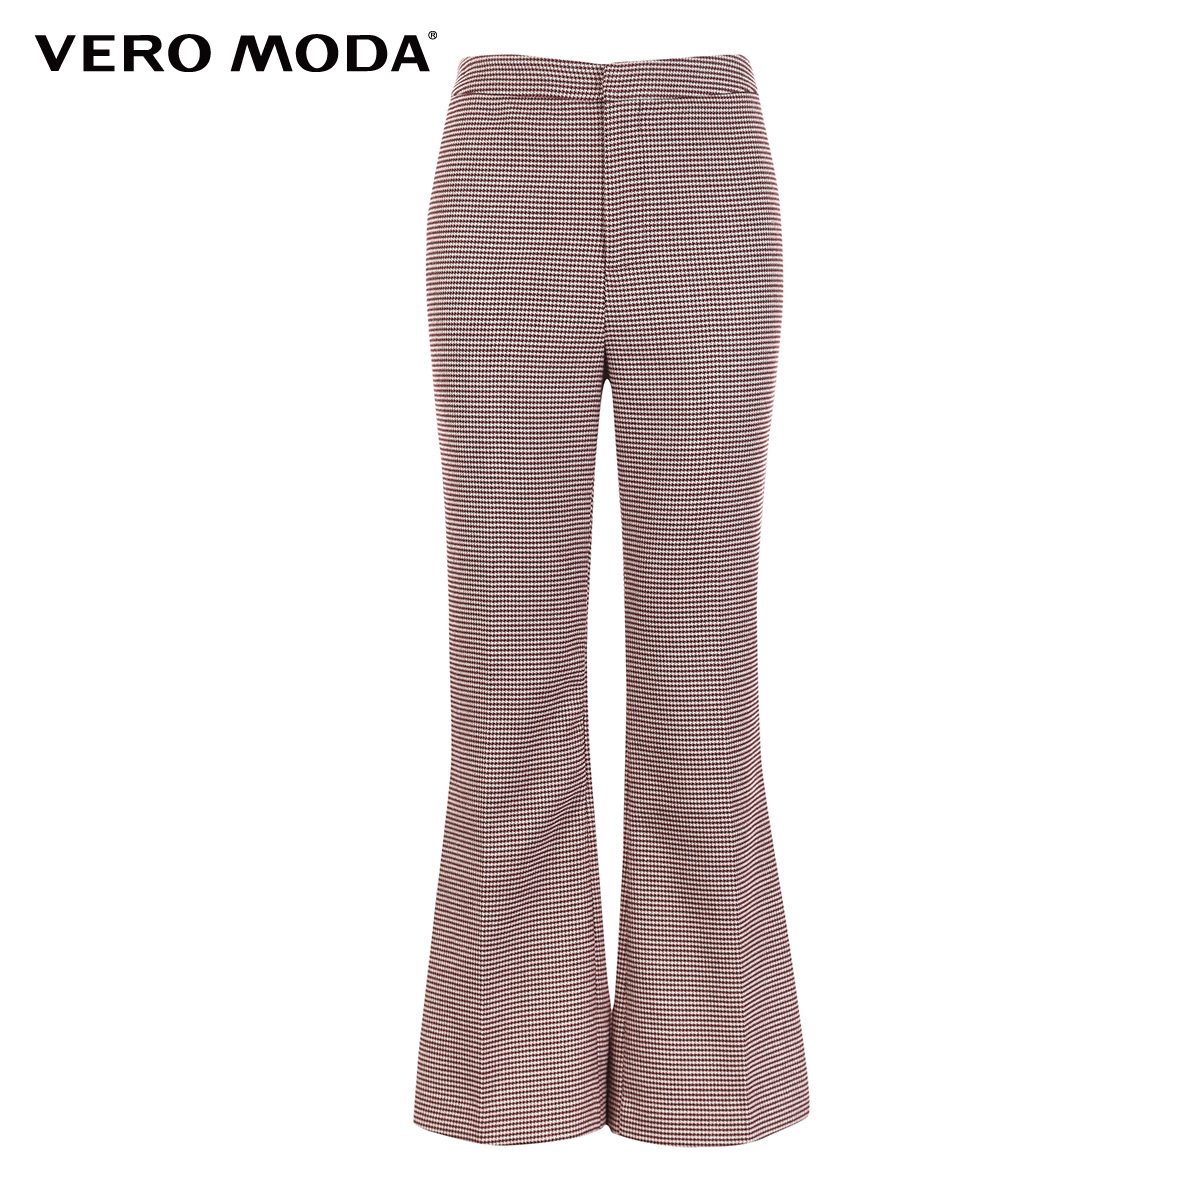 caramel S Gallo Placket Zipper Nuevo 2019 Acampanados Pantalones Vino 318350518 Vero Moda Camel 4fOqUwxnfv